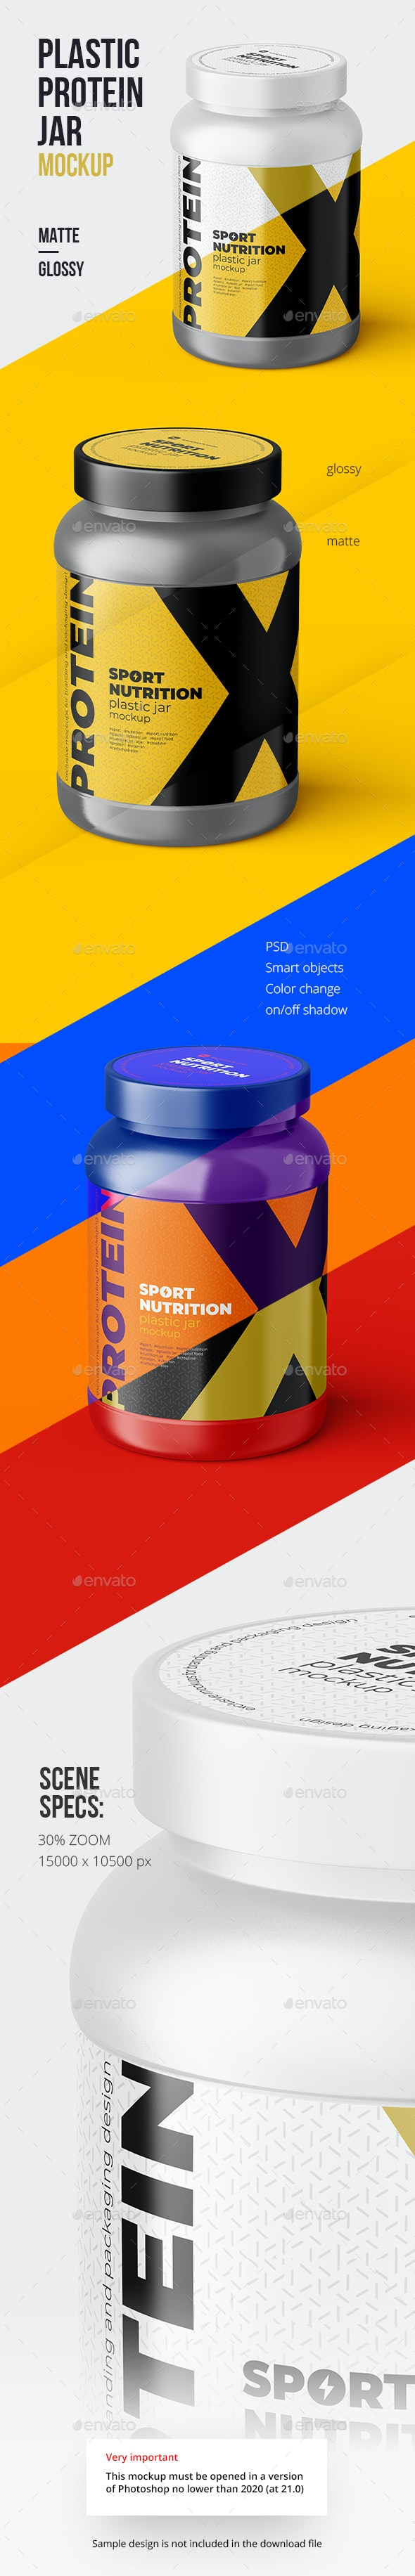 XL Sport Nutrition Plastic Jar Mockup - Food and Drink Packaging